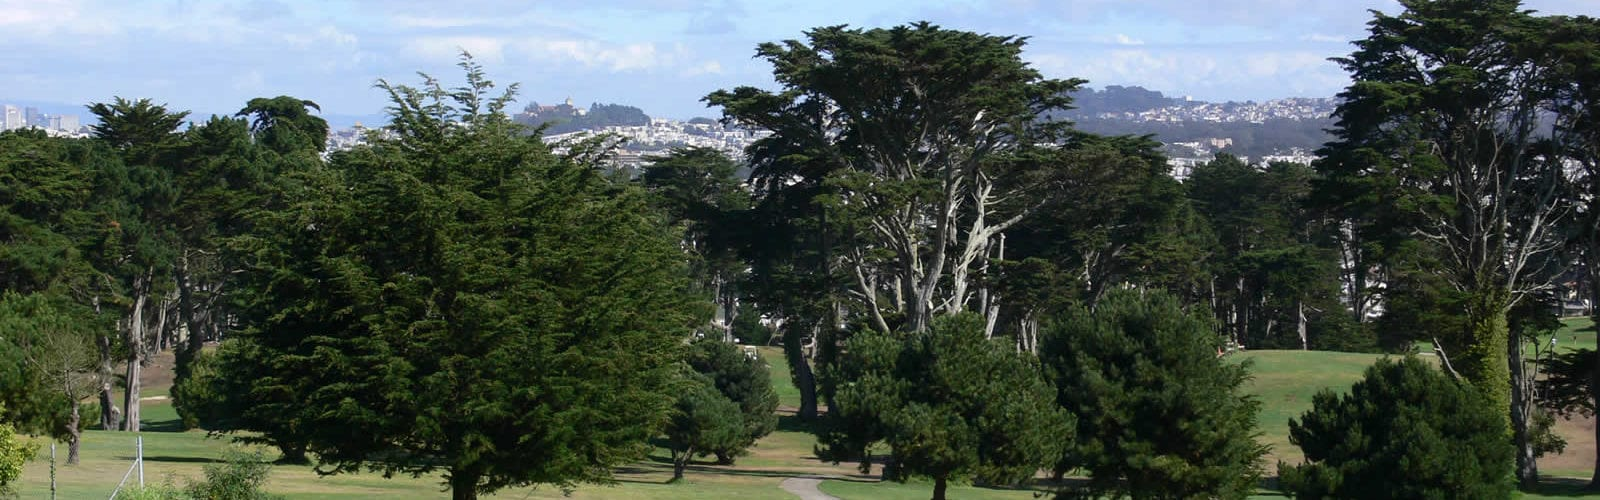 golf-lincoln-park-golf-course-san-francisco-une